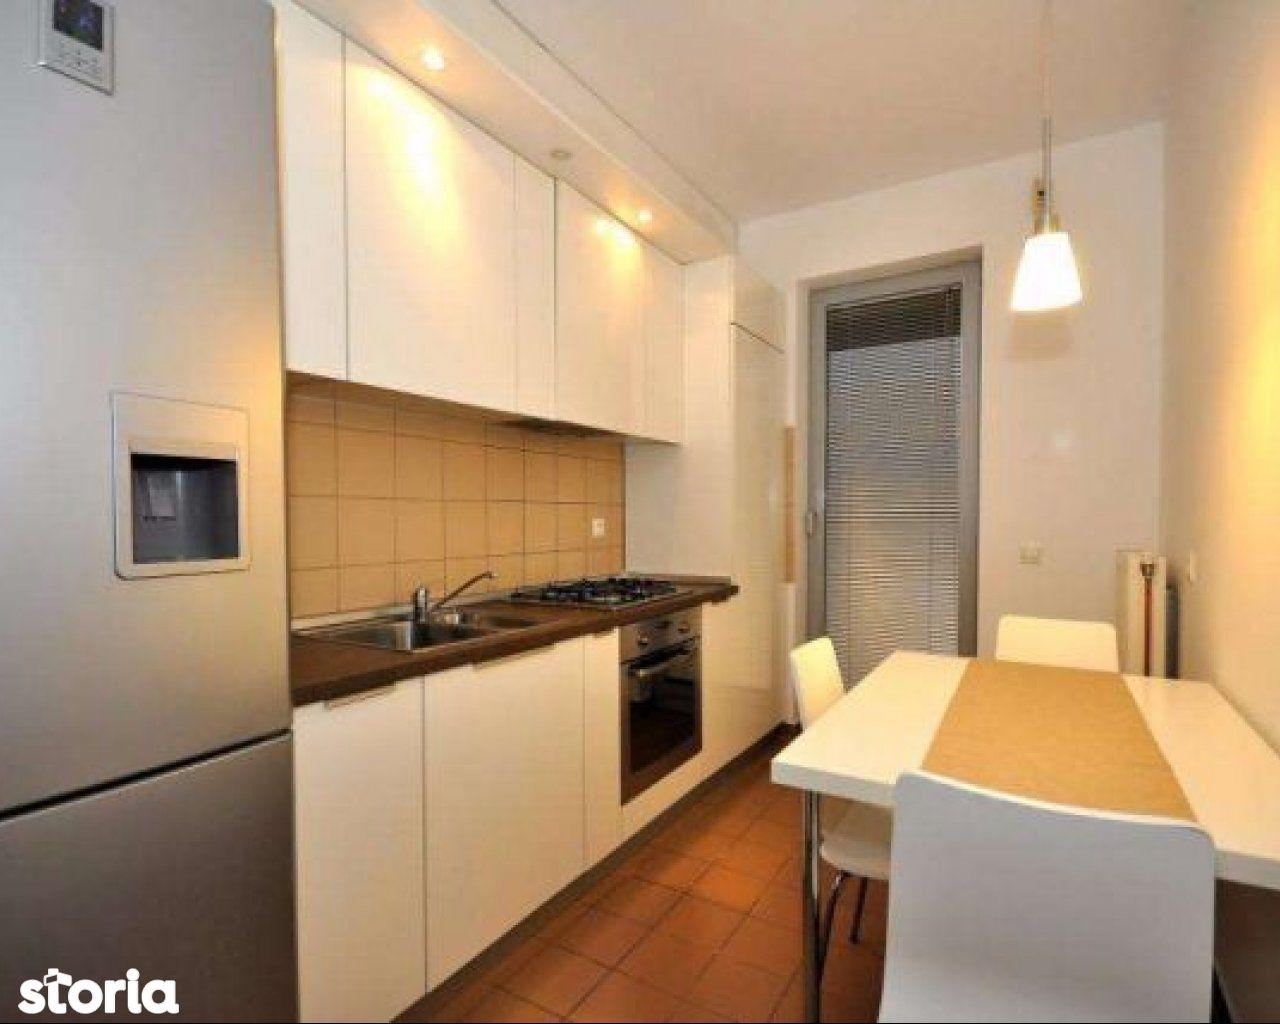 Apartament de vanzare, București (judet), Pasajul Mihai Bravu - Foto 5